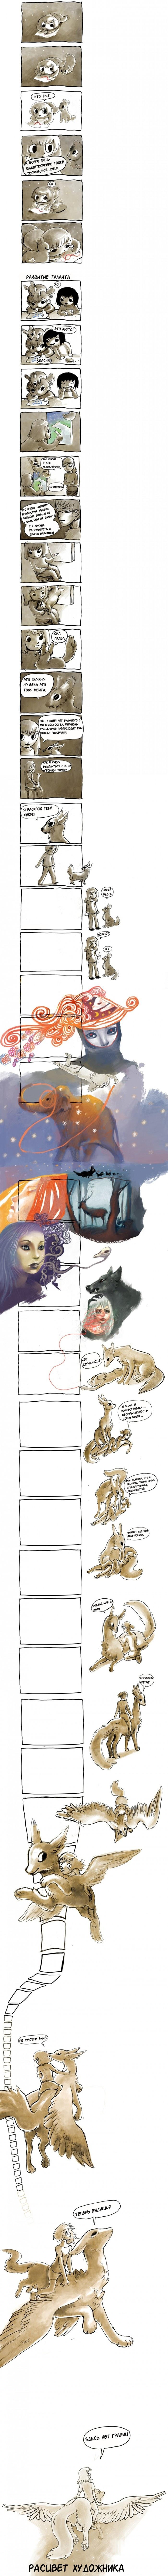 artist part 2